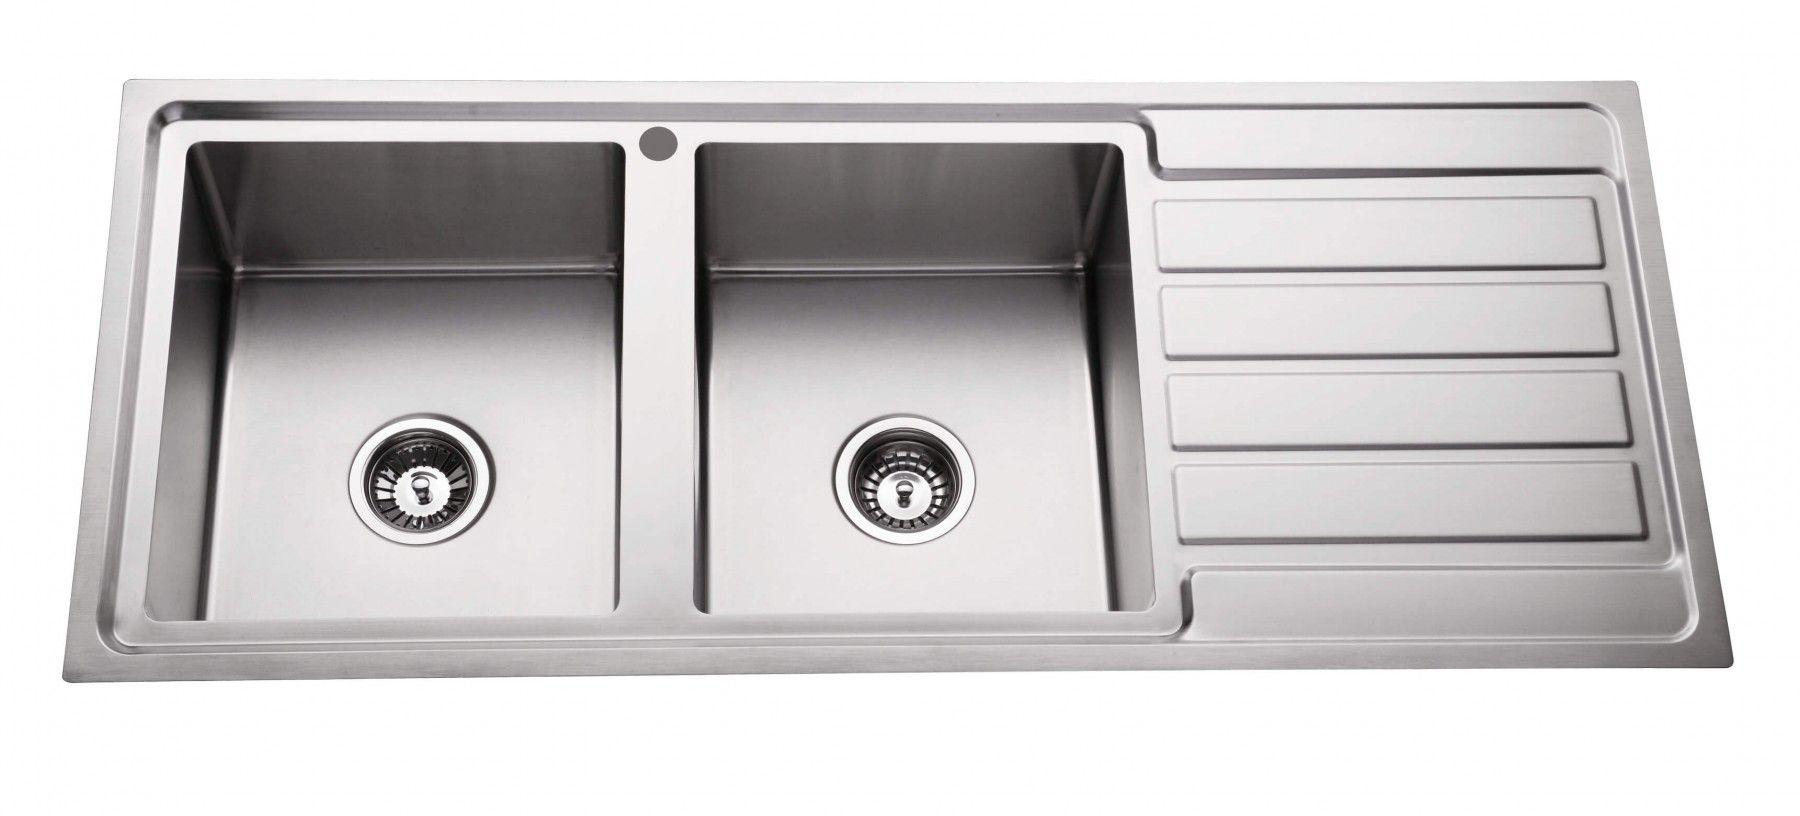 Lineare 1200mm Double Bowl Sink Drop In Sinks Kitchen Sinks Kitchen Laundry Bathware Direct Double Bowl Sink Bowl Sink Kitchen Fittings